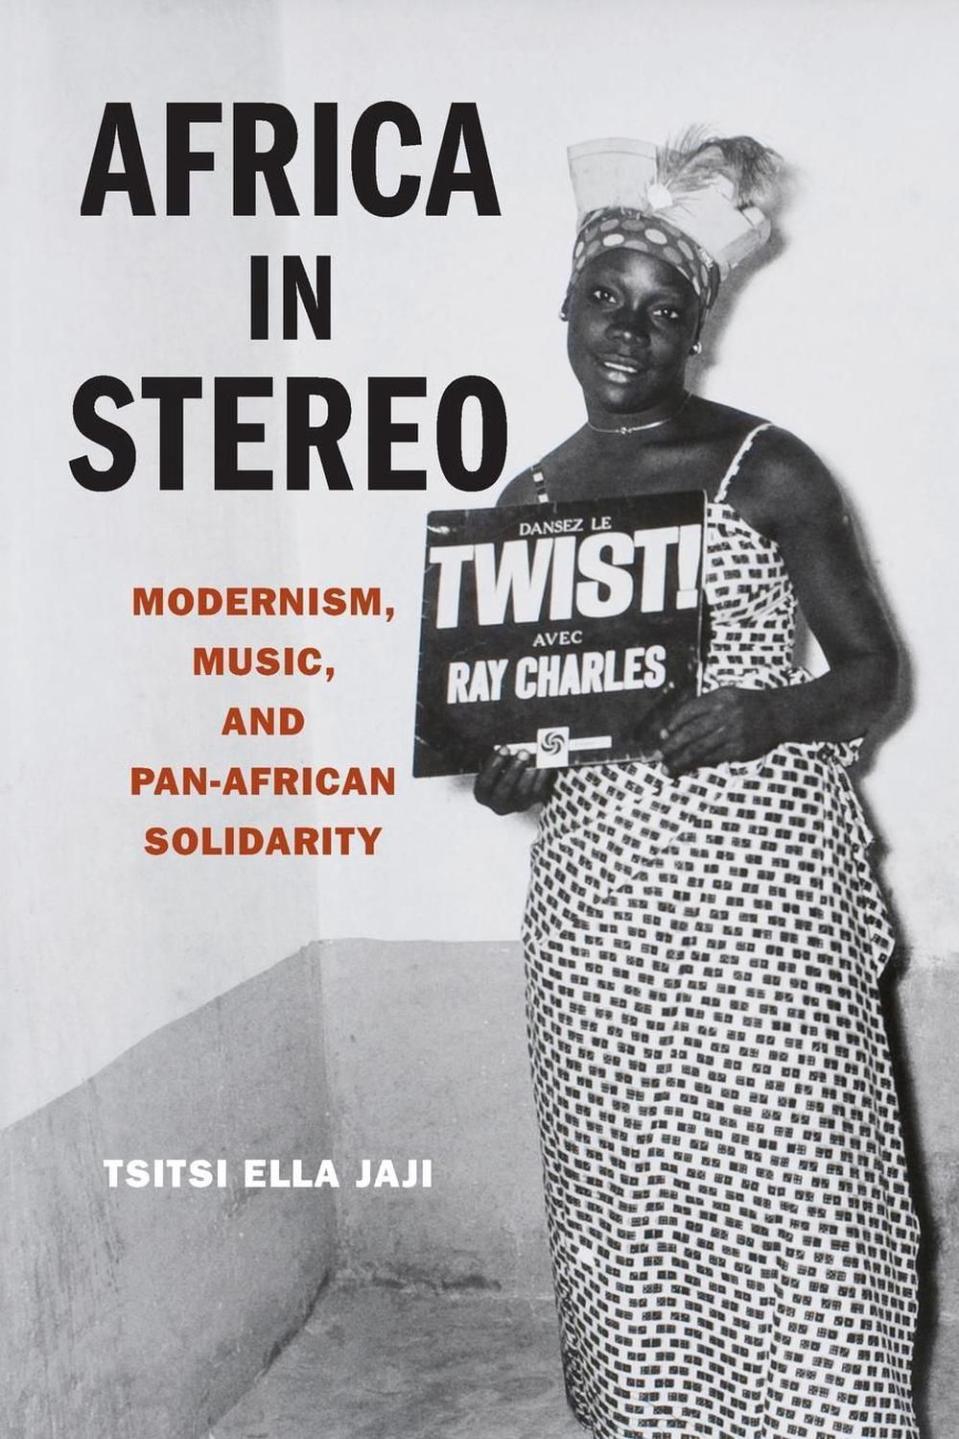 Africa in Stereo: Modernism, Music, and Pan-African Solidarity by Tsitsi Jaji (E